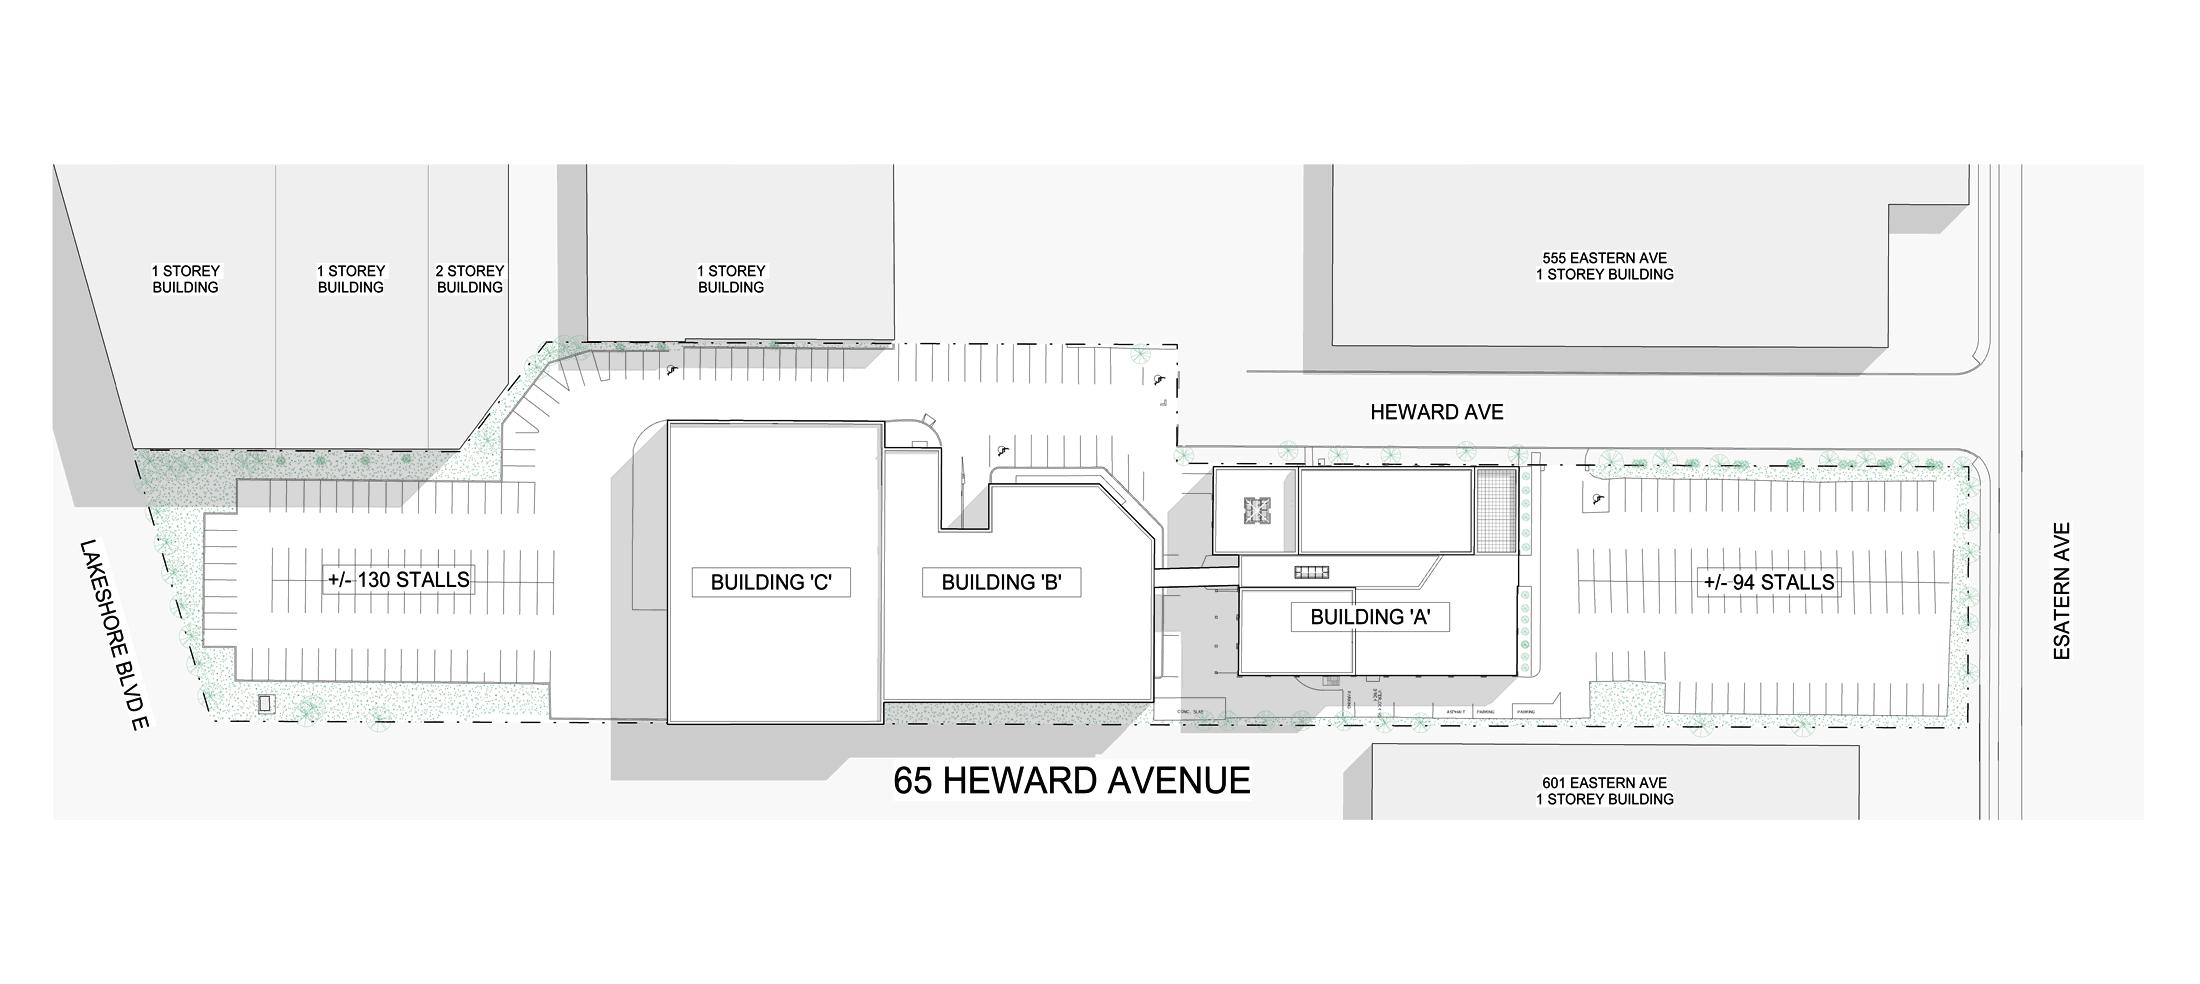 Building A Ground Floor Floorplan